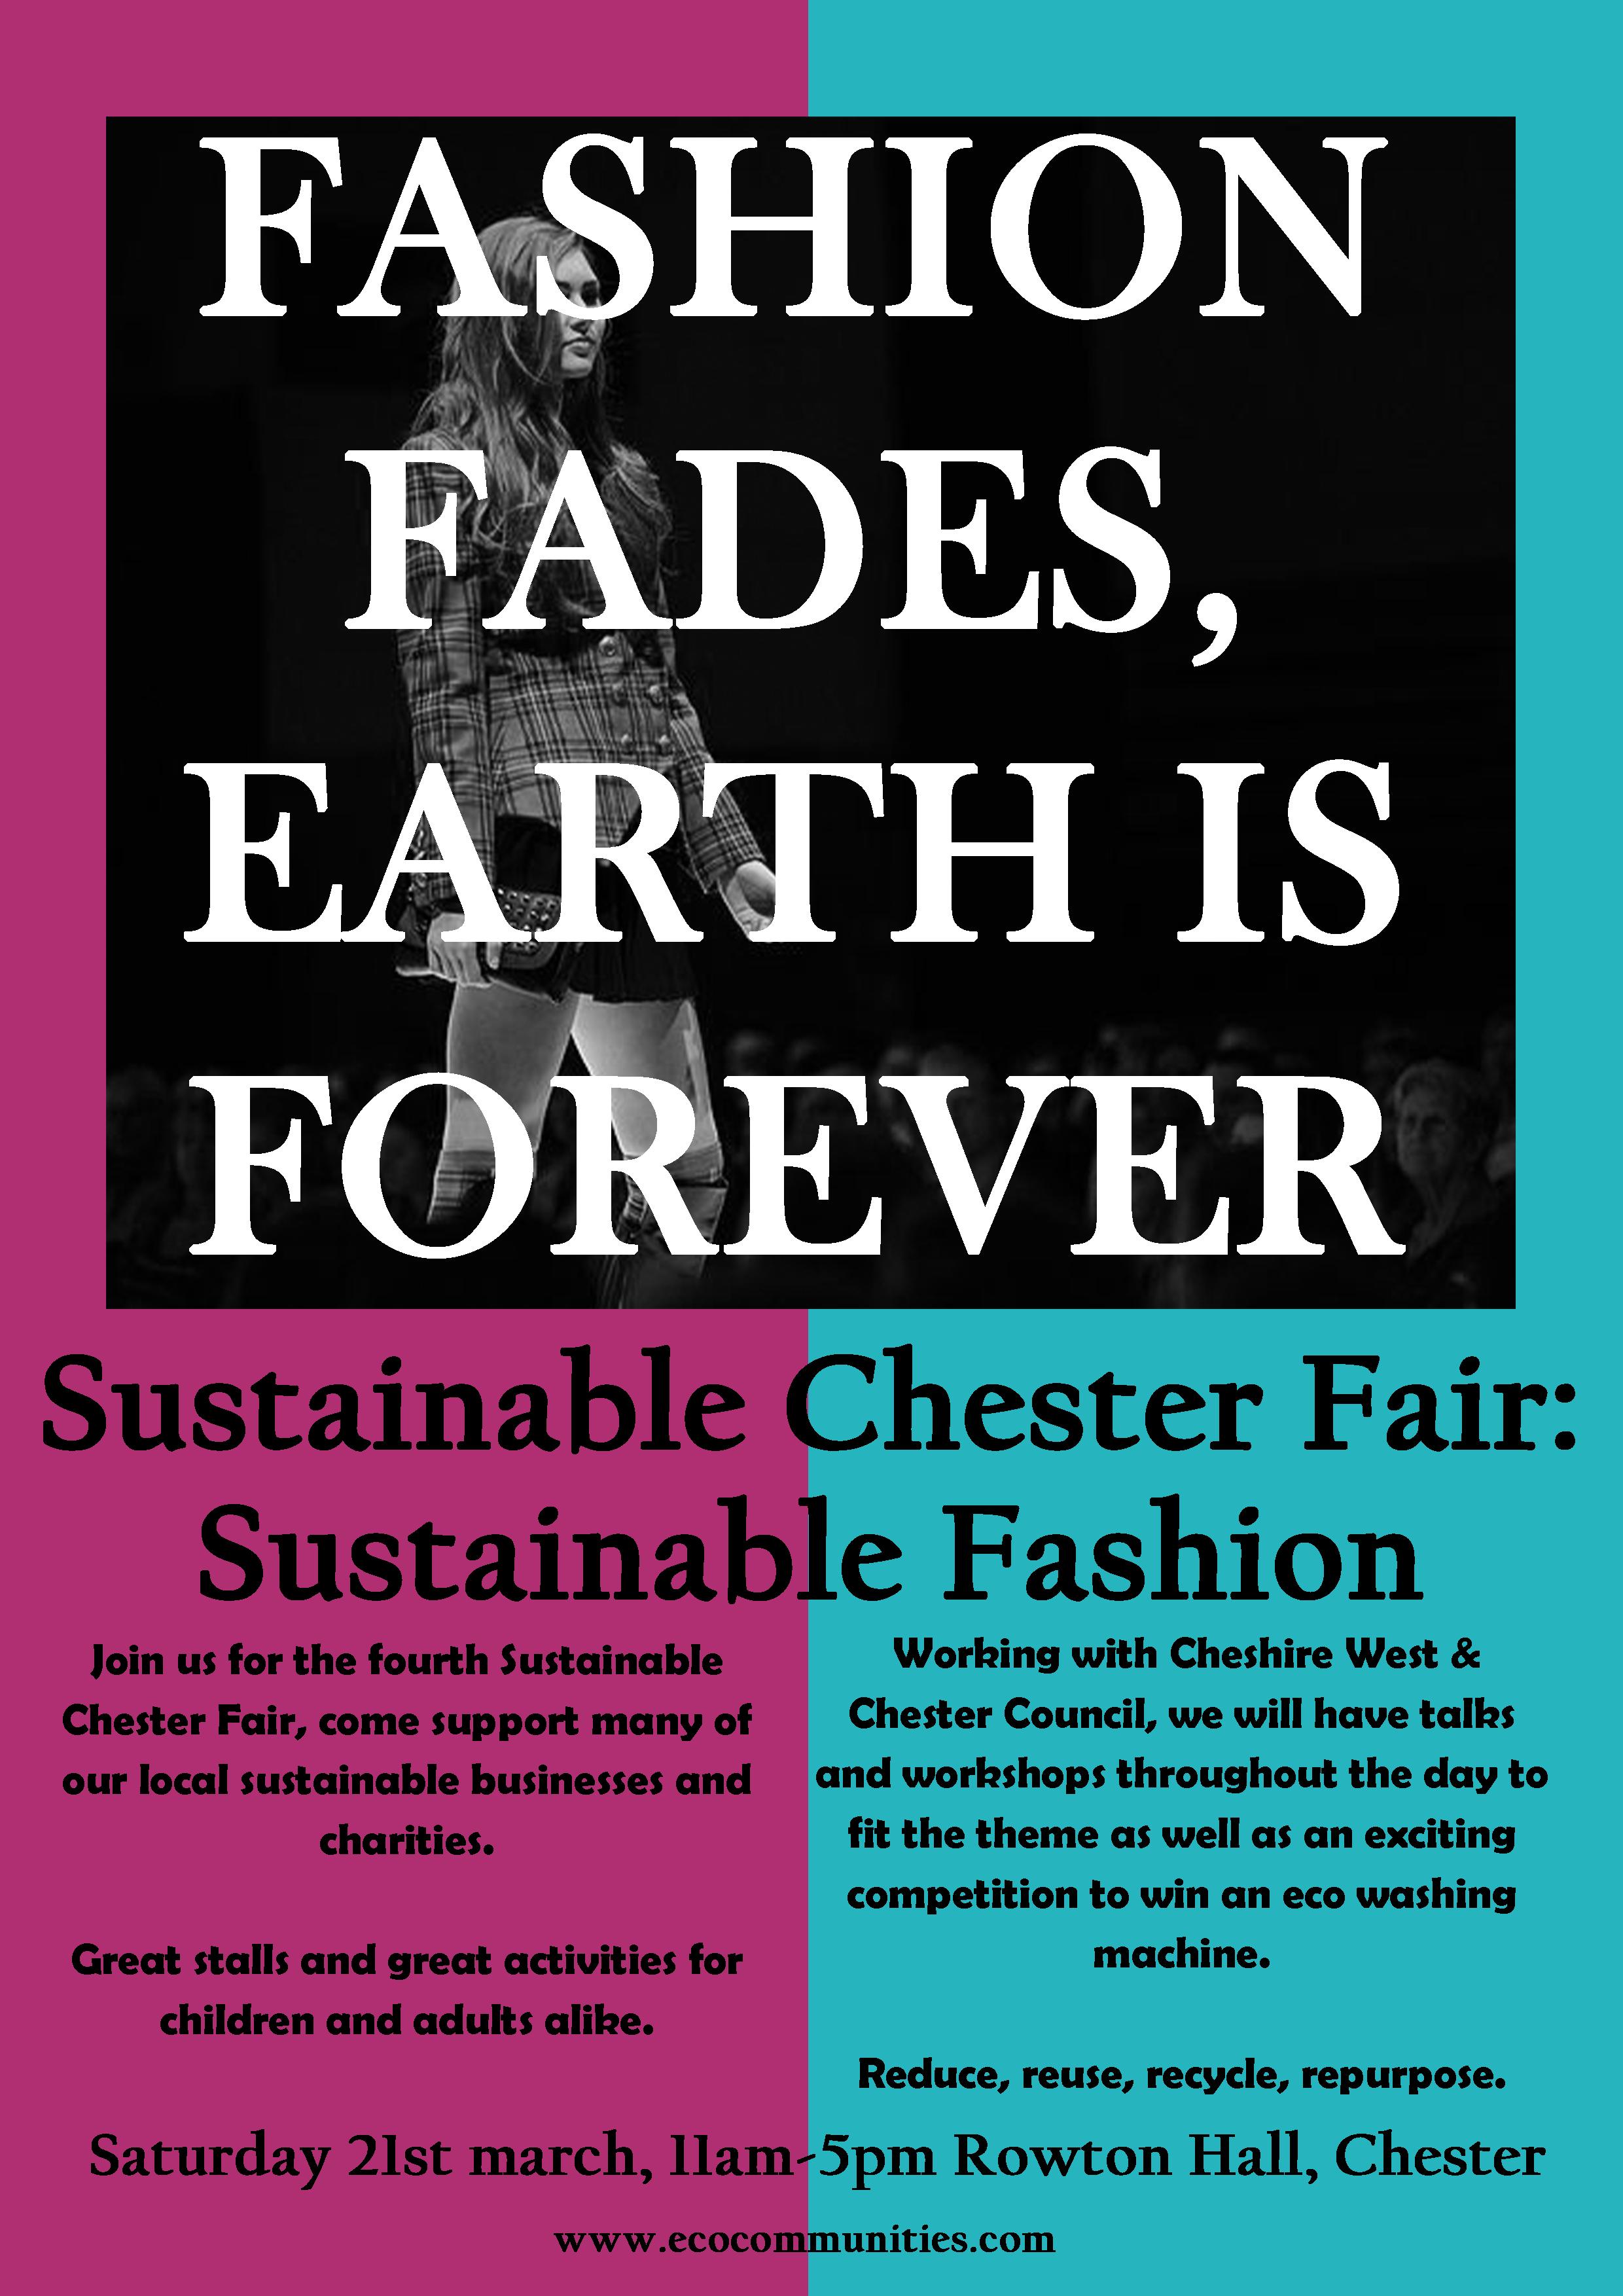 Sustainble chester Fair & Sustainable fashion